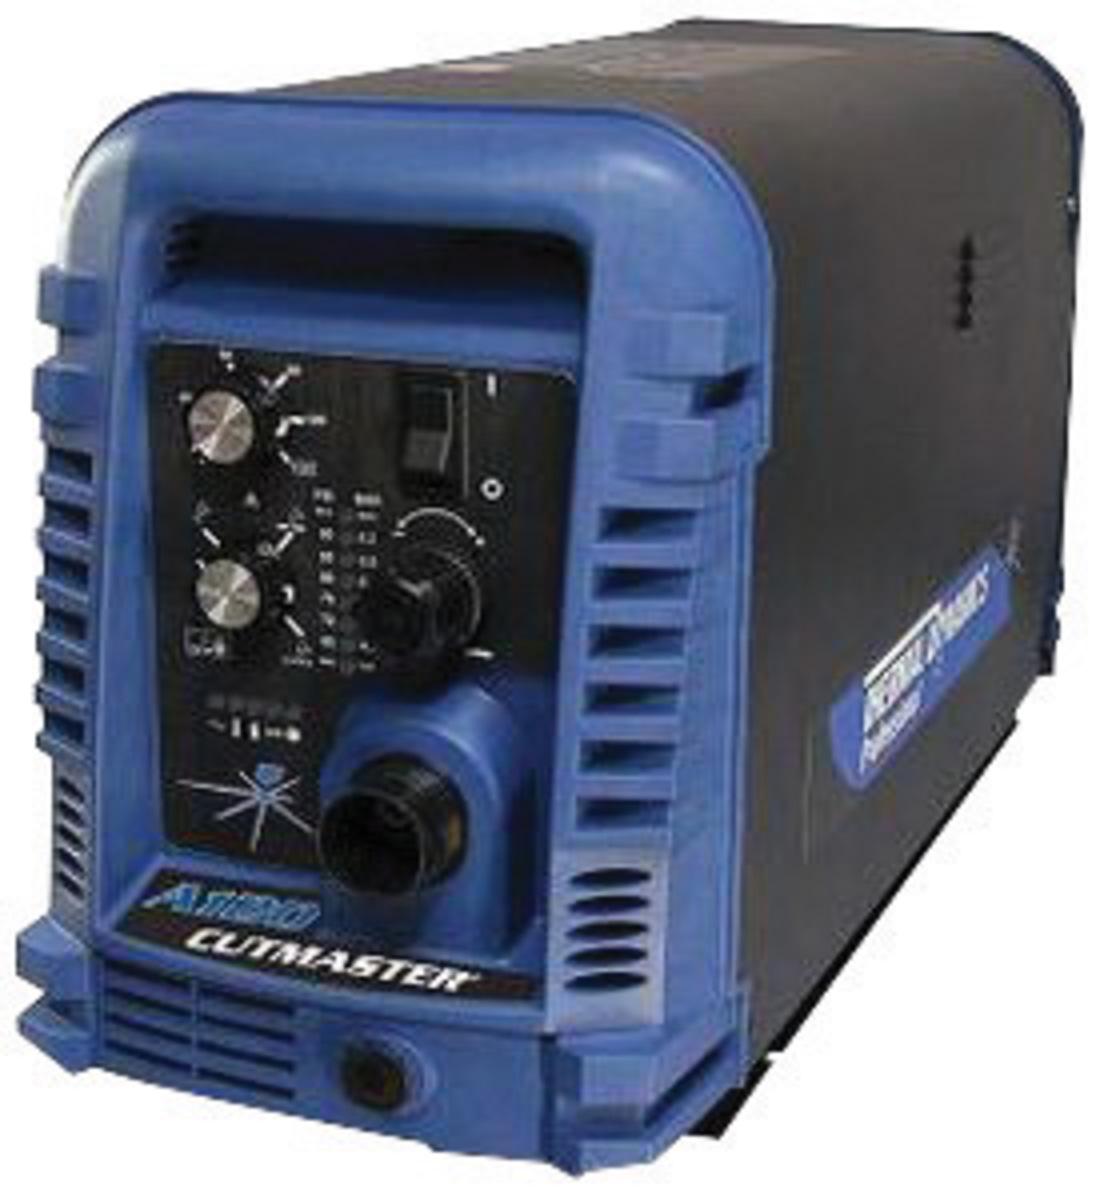 Airgas Tdc3 1734 1 Thermal Dynamics Cutmaster A120 Plasma